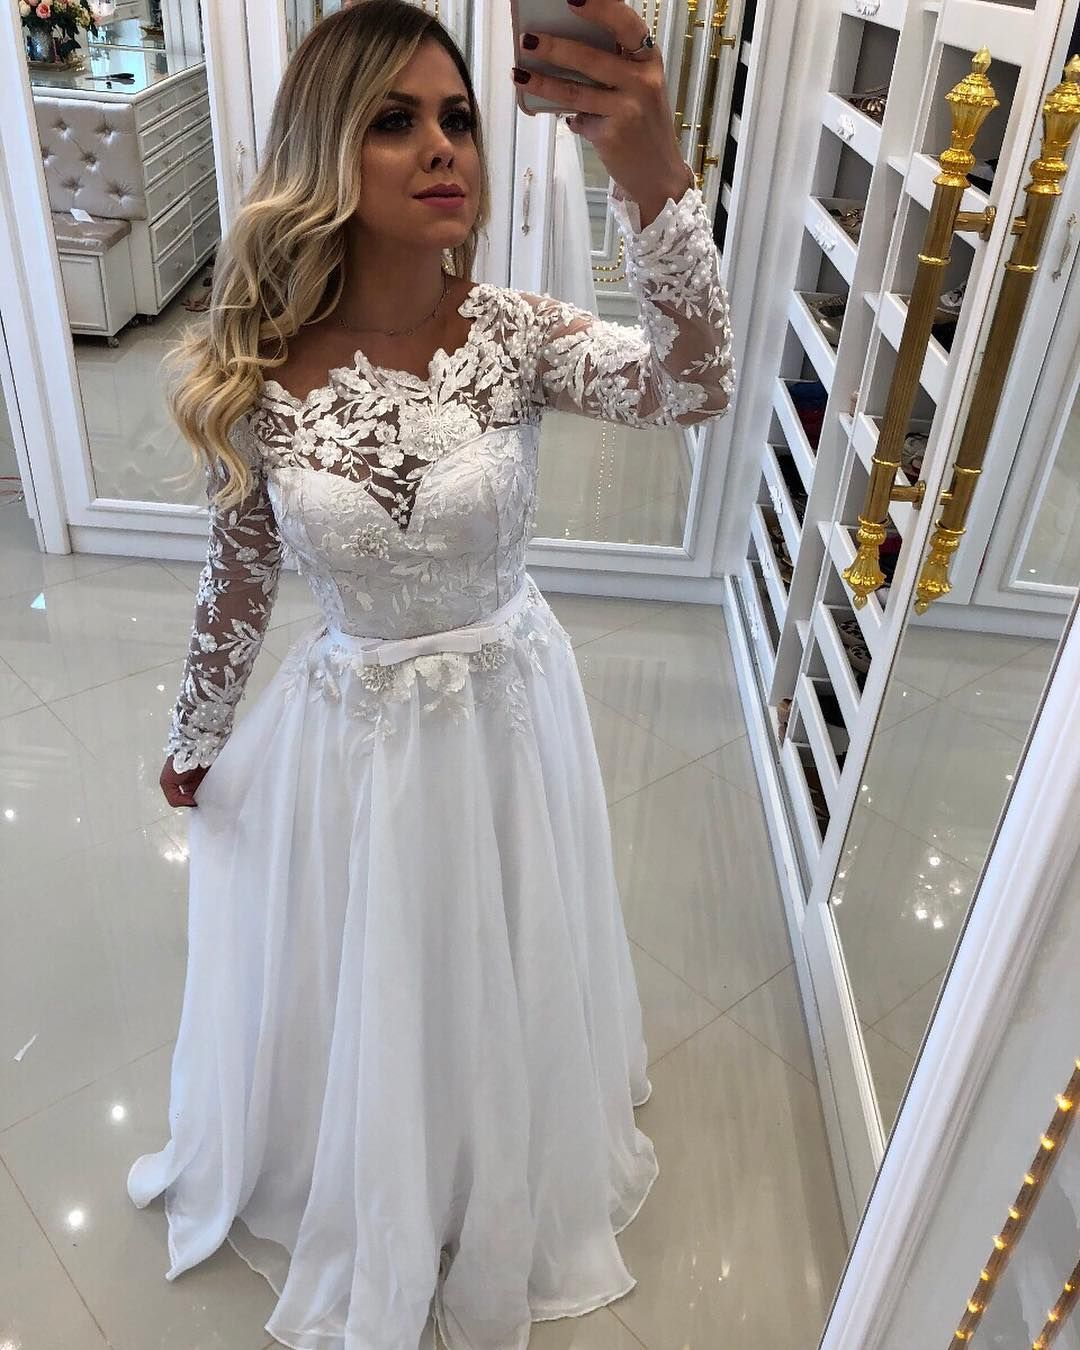 Atelier Vestidos Barbara Melo On Instagram E Olha Só Quem